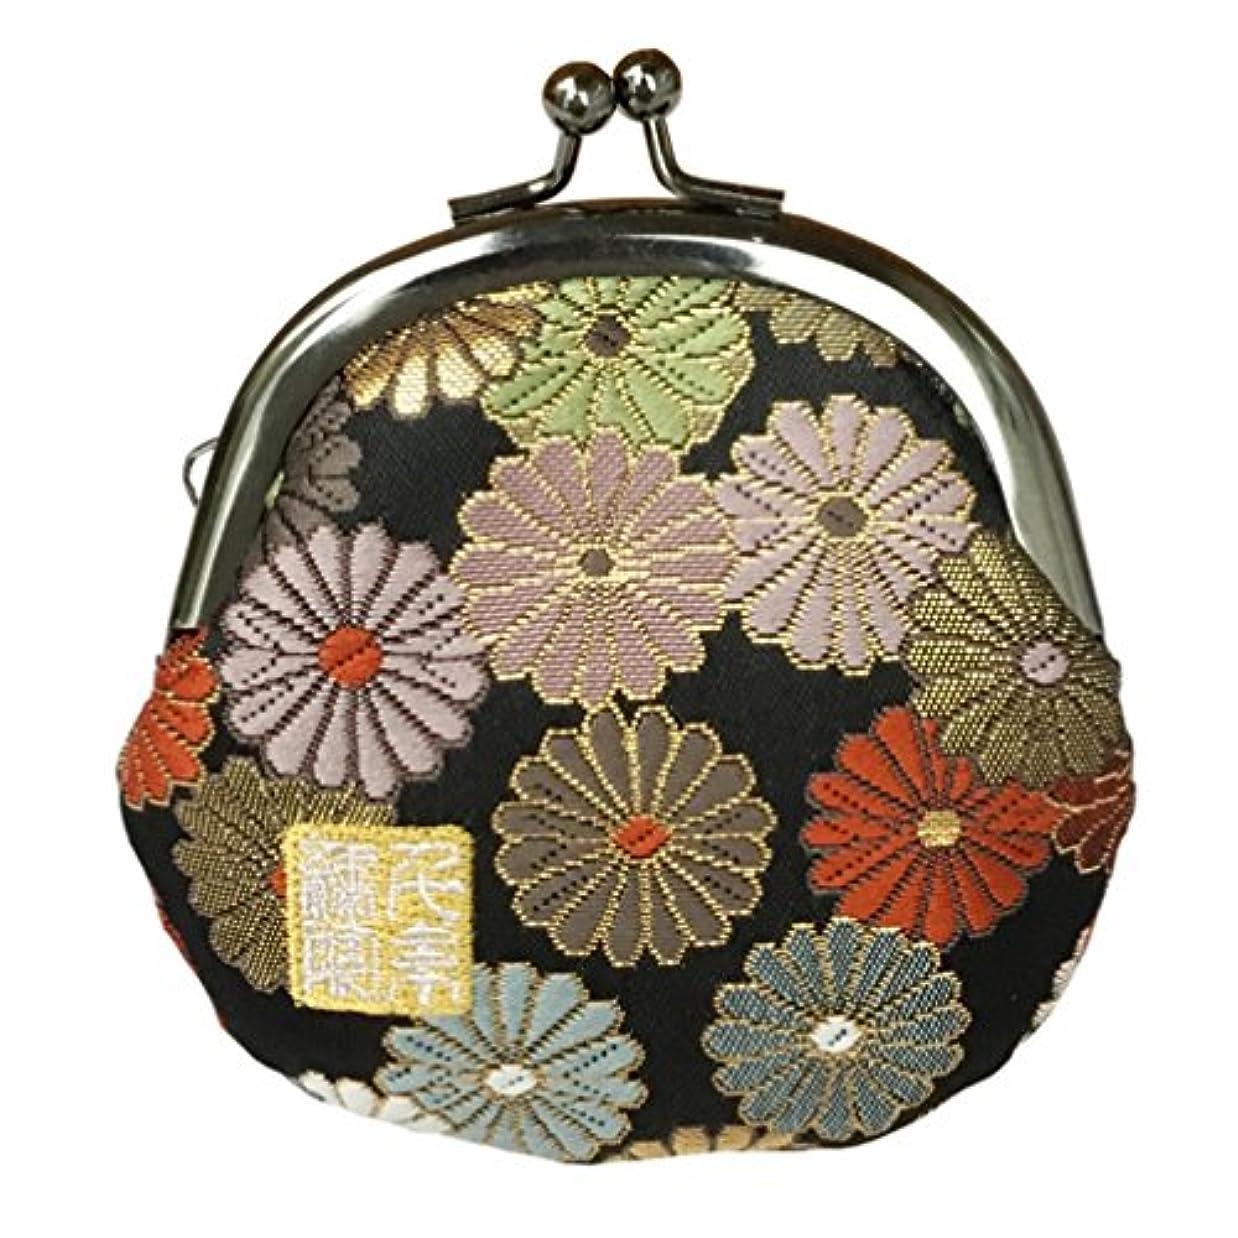 千糸繍院 西陣織 金襴 がま口 2.5寸丸型財布/小銭入れ(裏地付き)